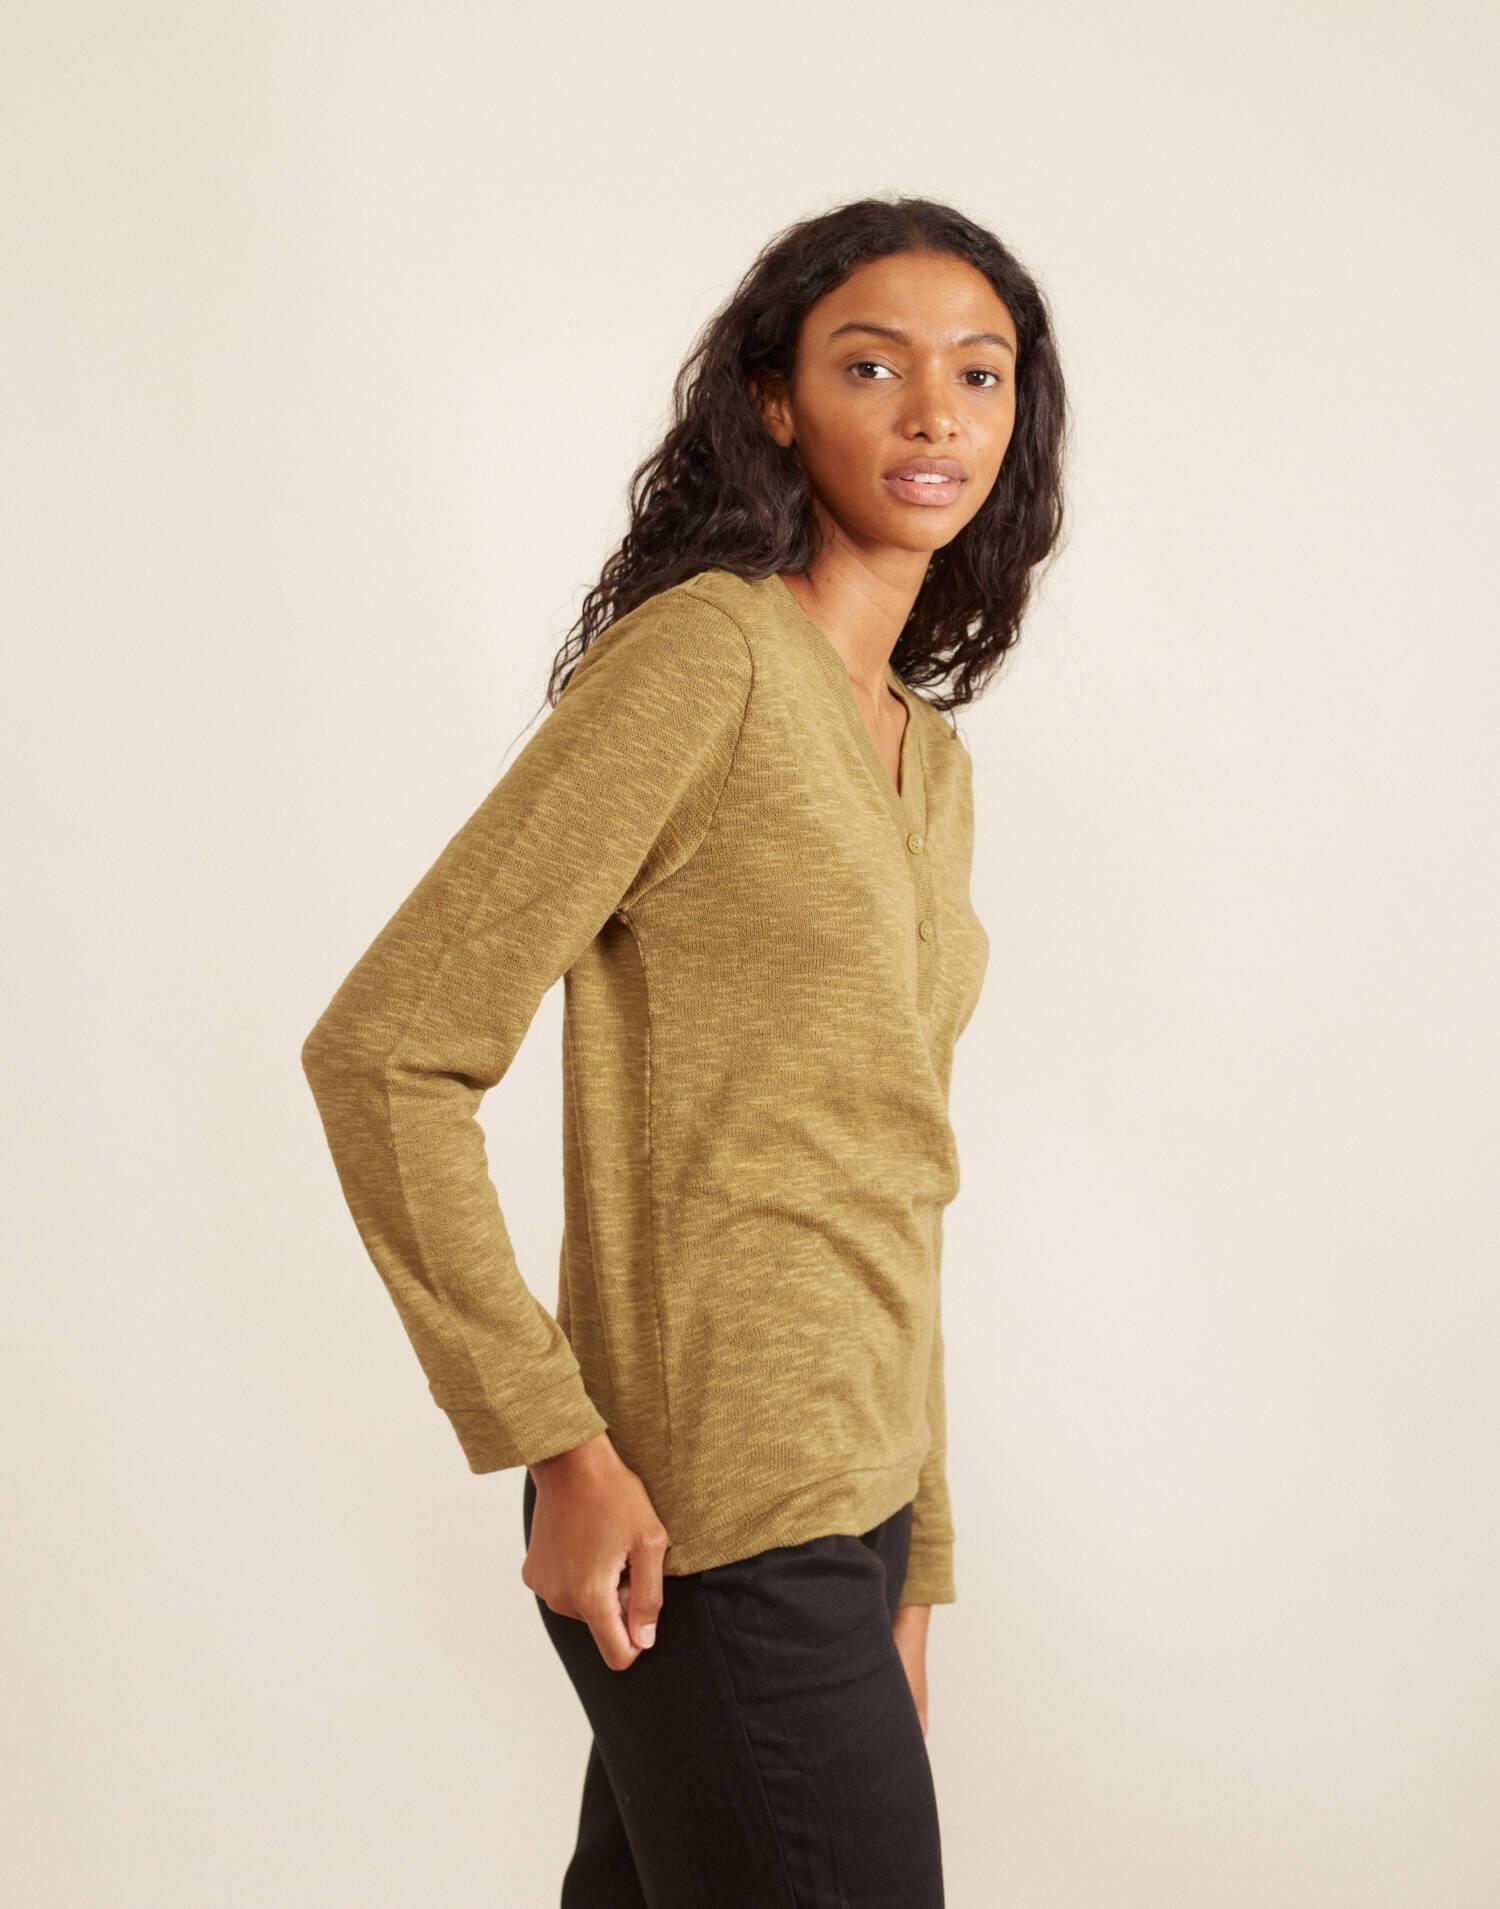 Rustic henley shirt